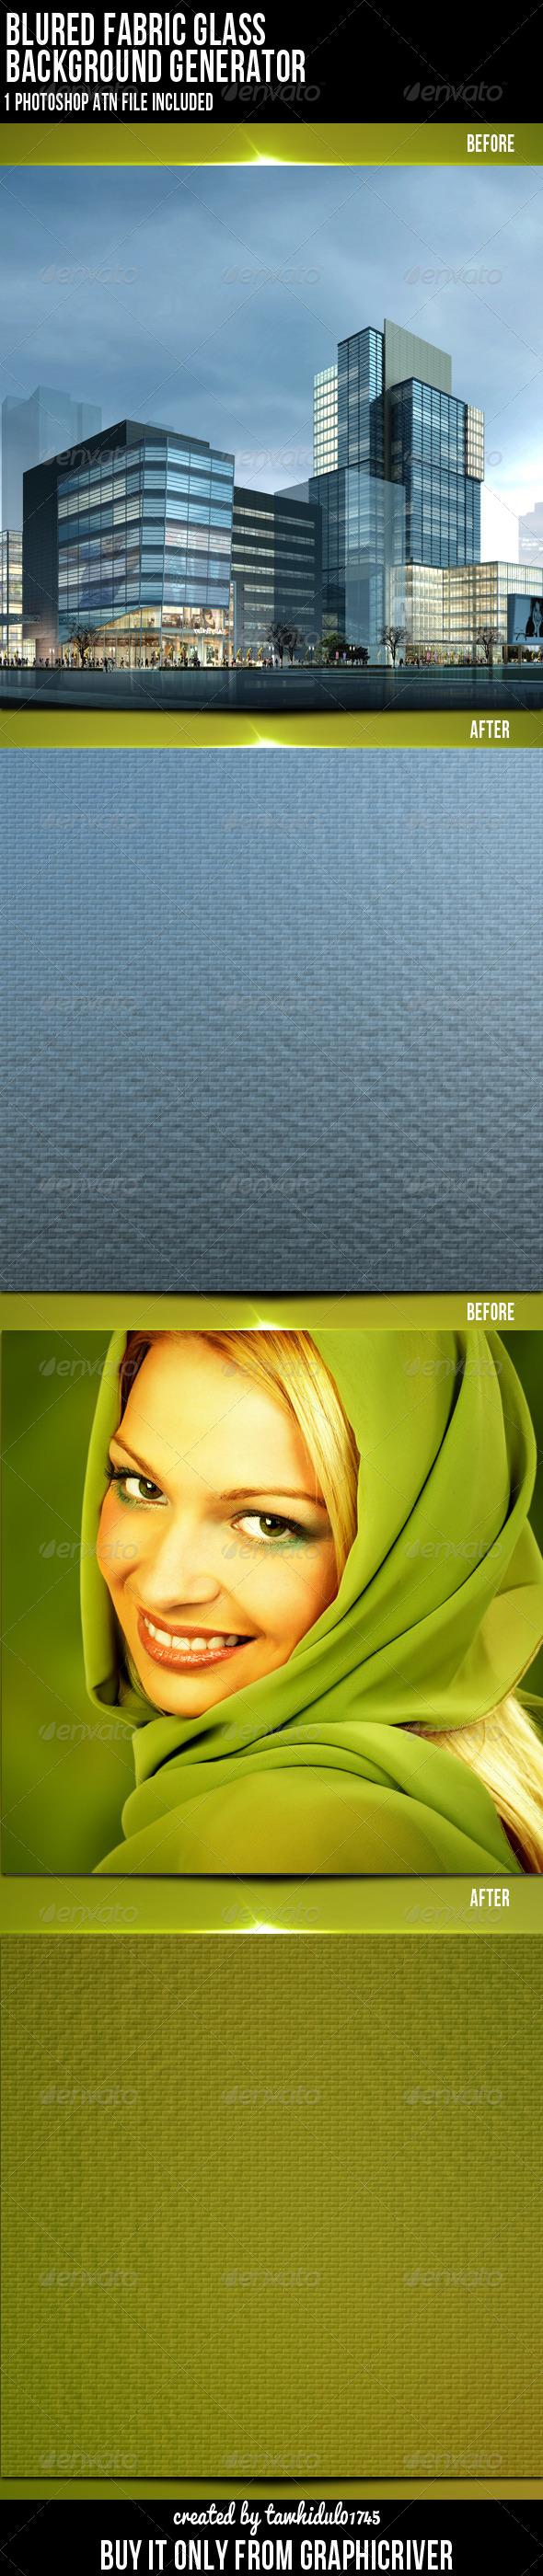 GraphicRiver Background Generator Photoshop Action 5021647